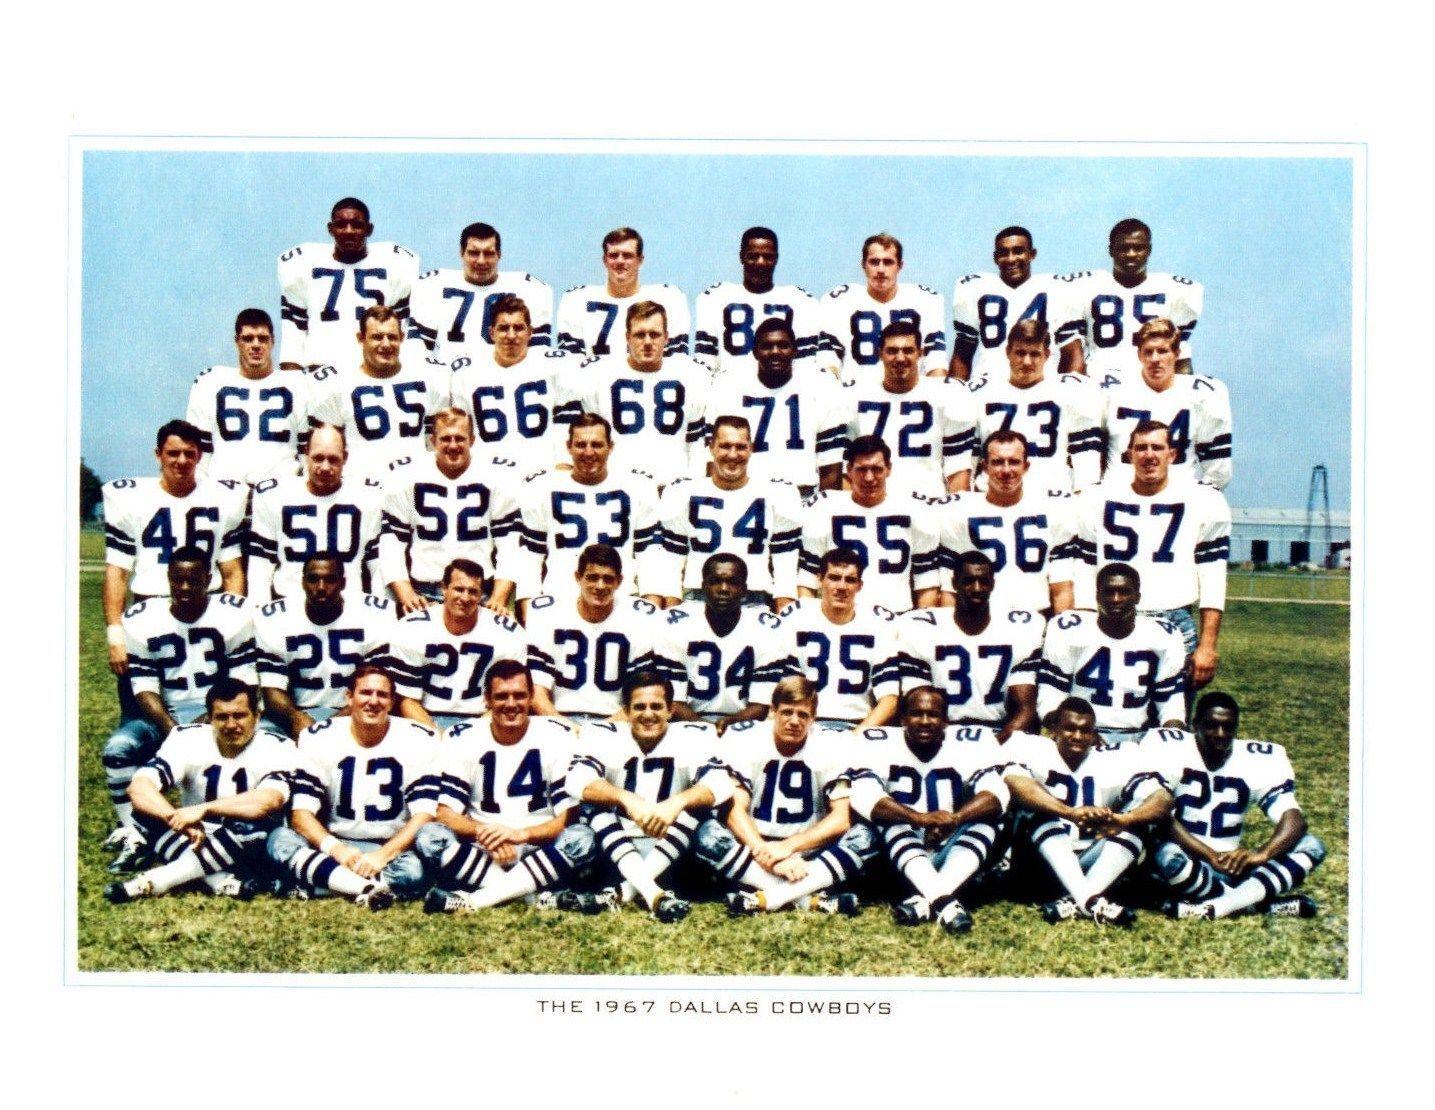 1967 Dallas Cowboys Dallas Cowboys Cowboys Dallas